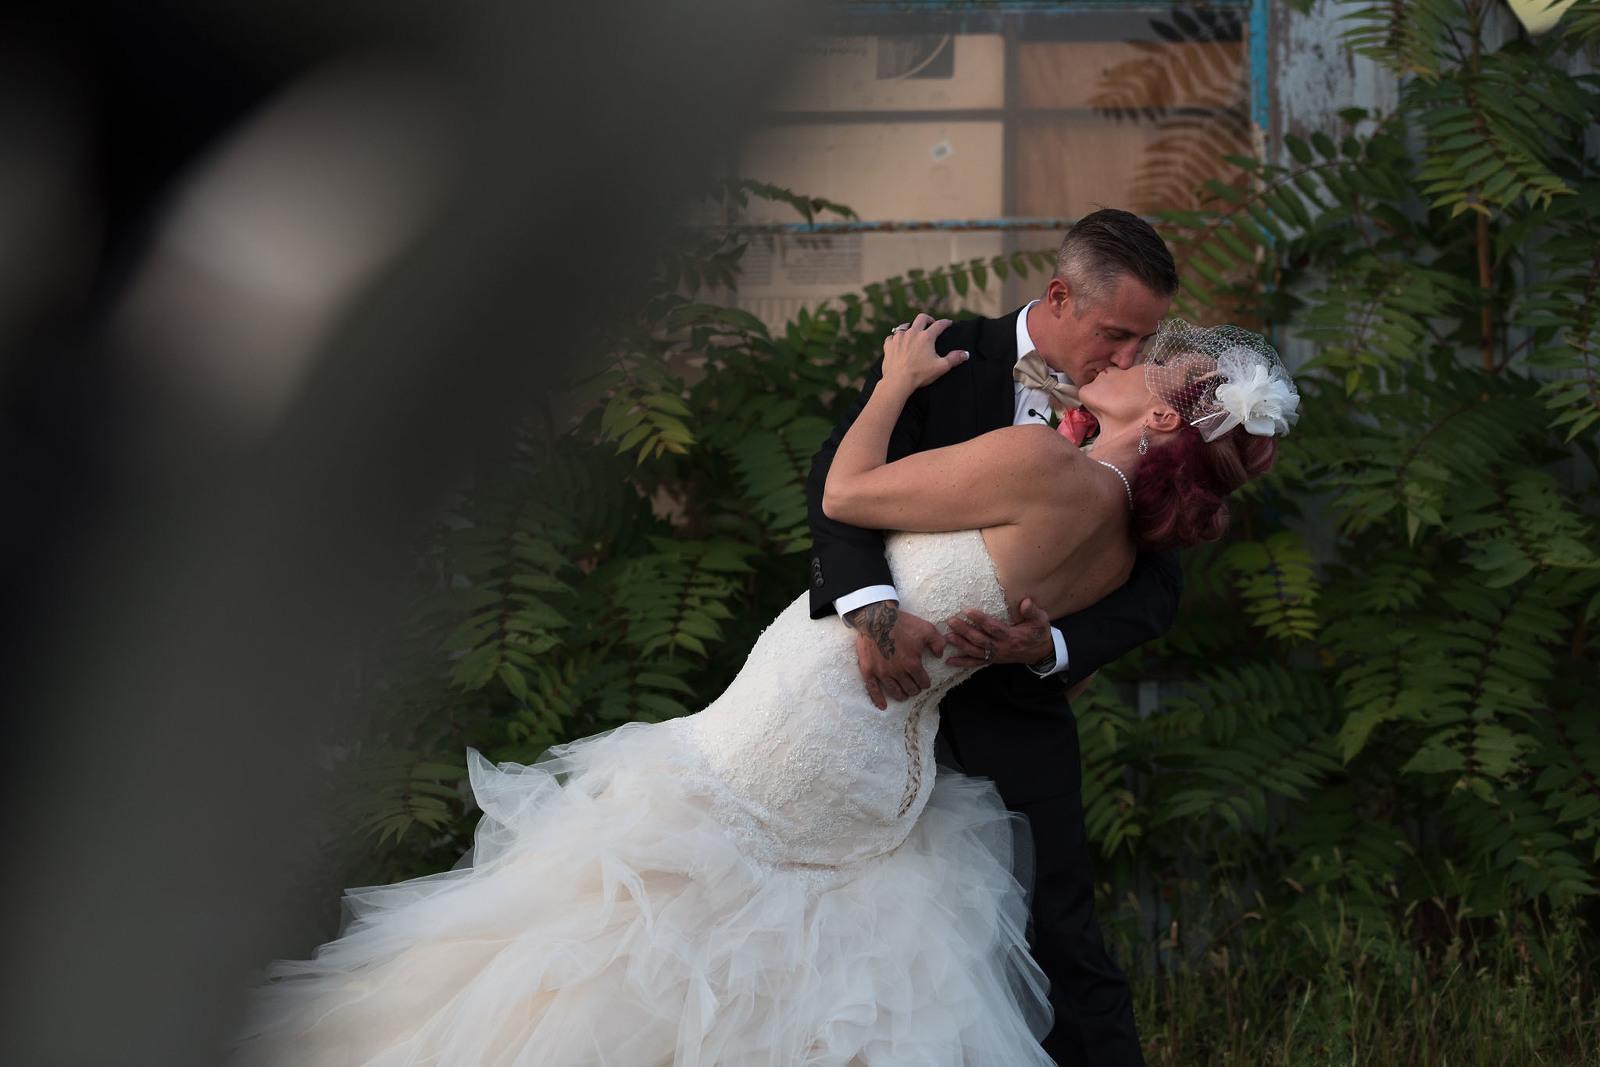 Auburn Wedding Photographer, bride and groom kissing, vintage wedding, couture wedding dress, tattooed bride and groom, Auburn Indiana, Kasey Wallace Photography - www.kaseywallacephoto.com